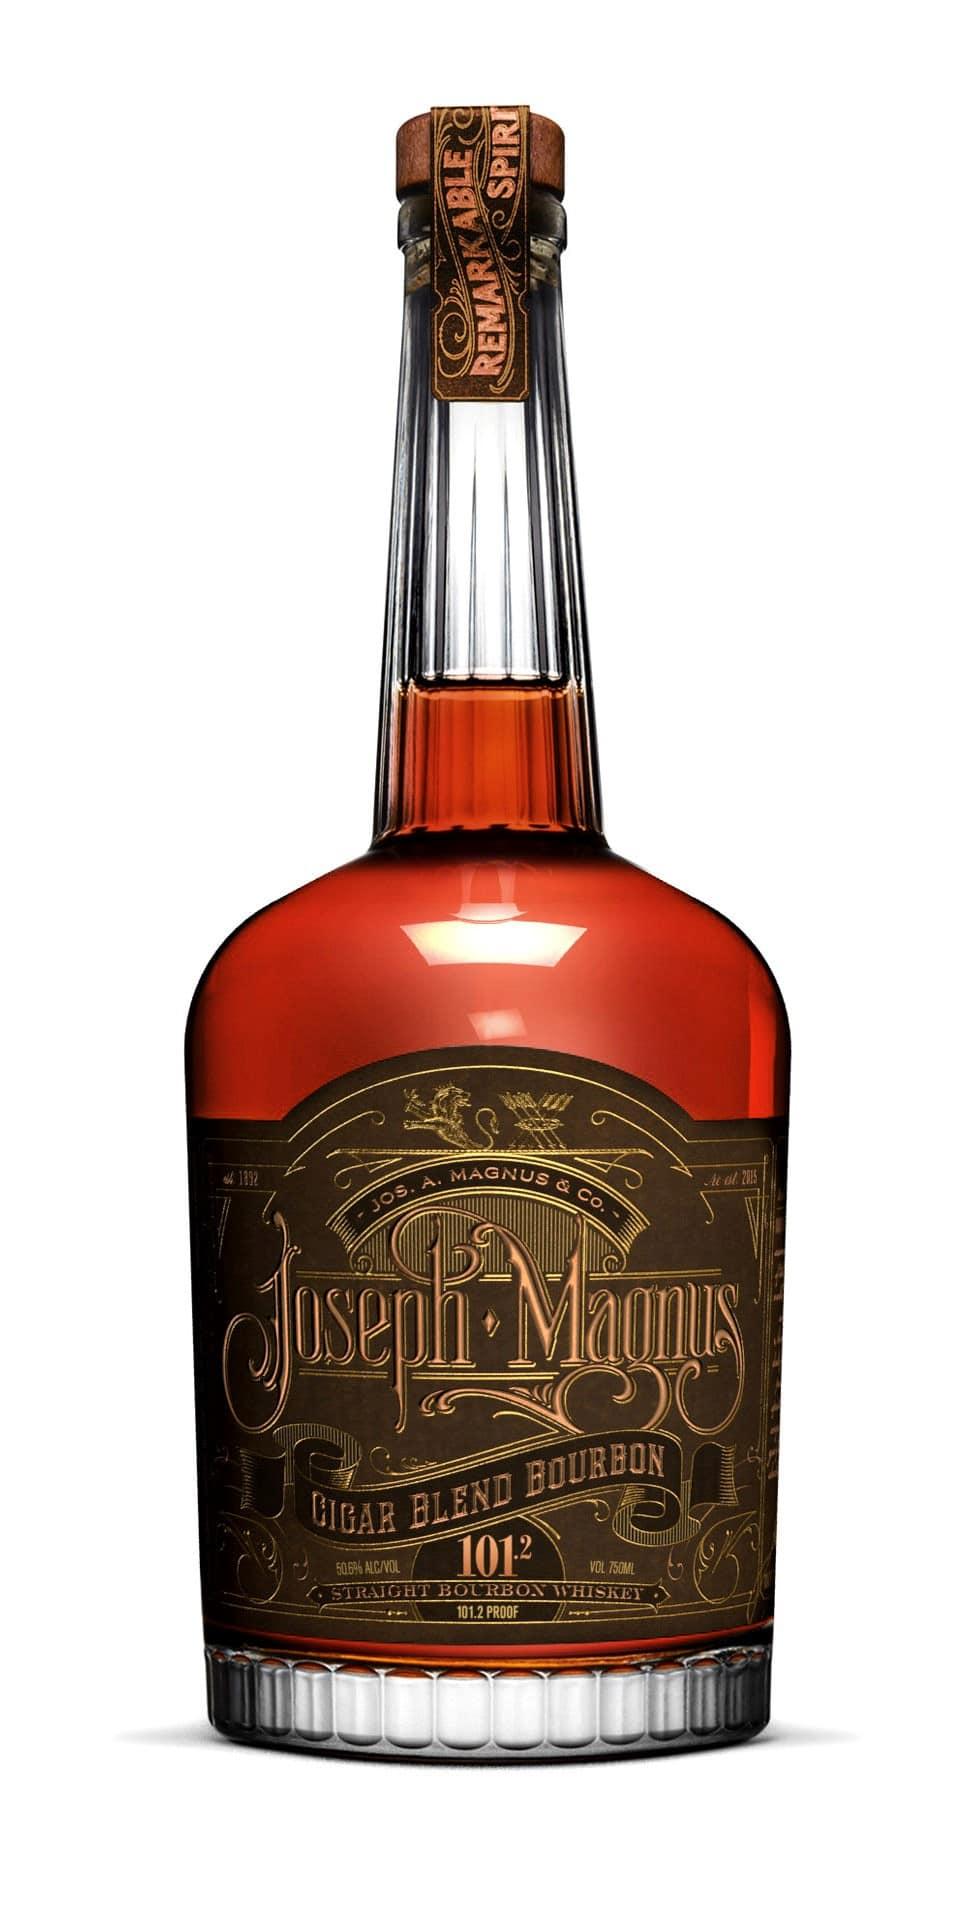 Jos. A. Magnus & Co Cigar Blend Bourbon